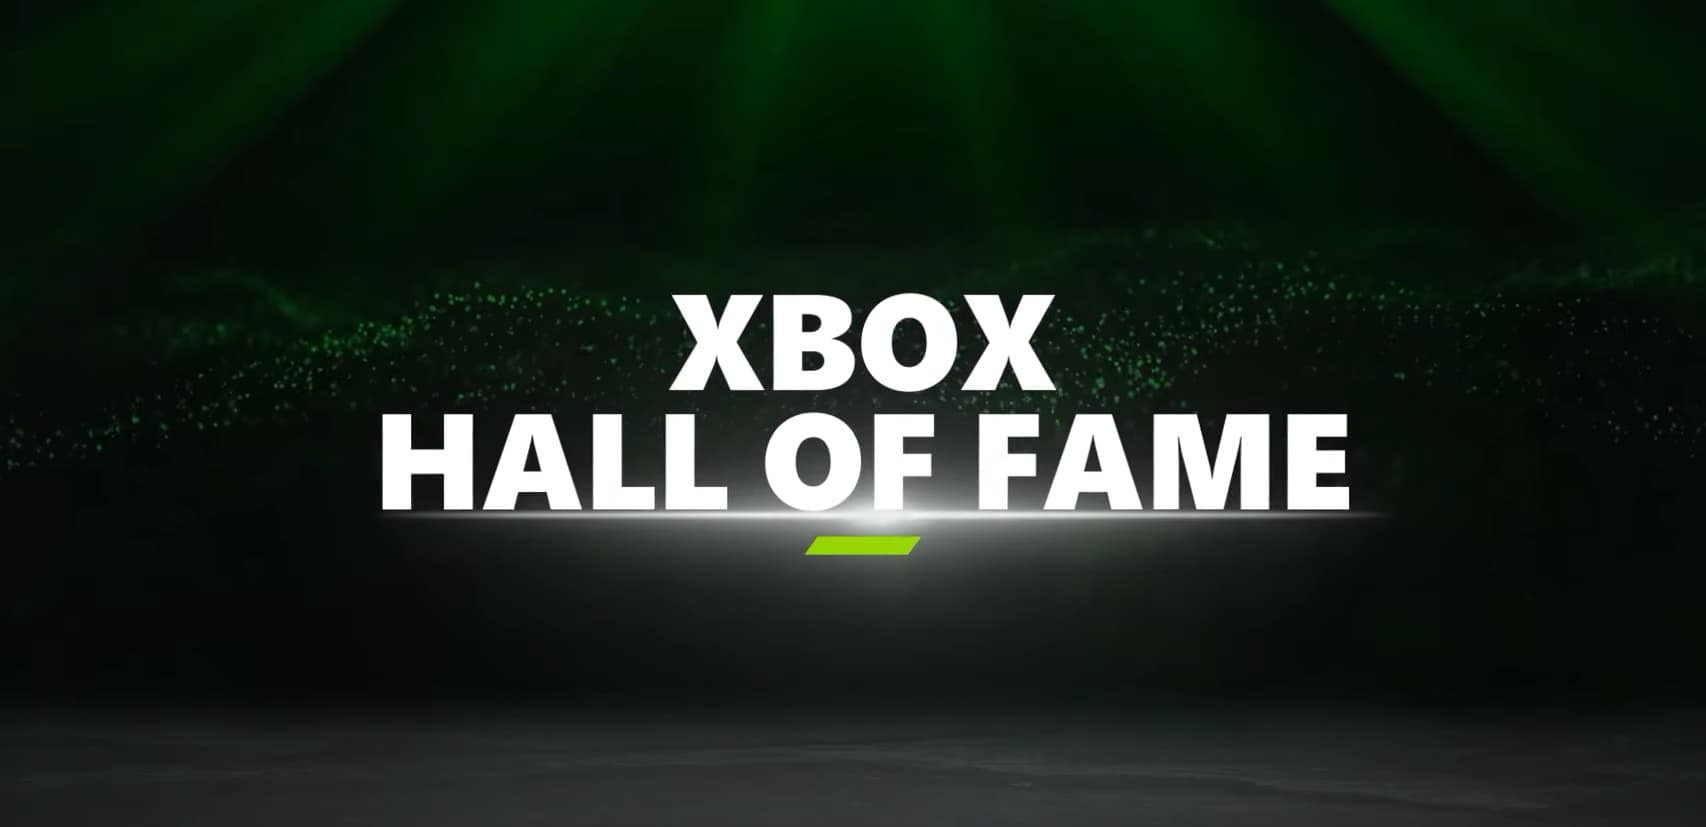 Consigue una Xbox Series X gratis gracias a Xbox Hall of Fame 9